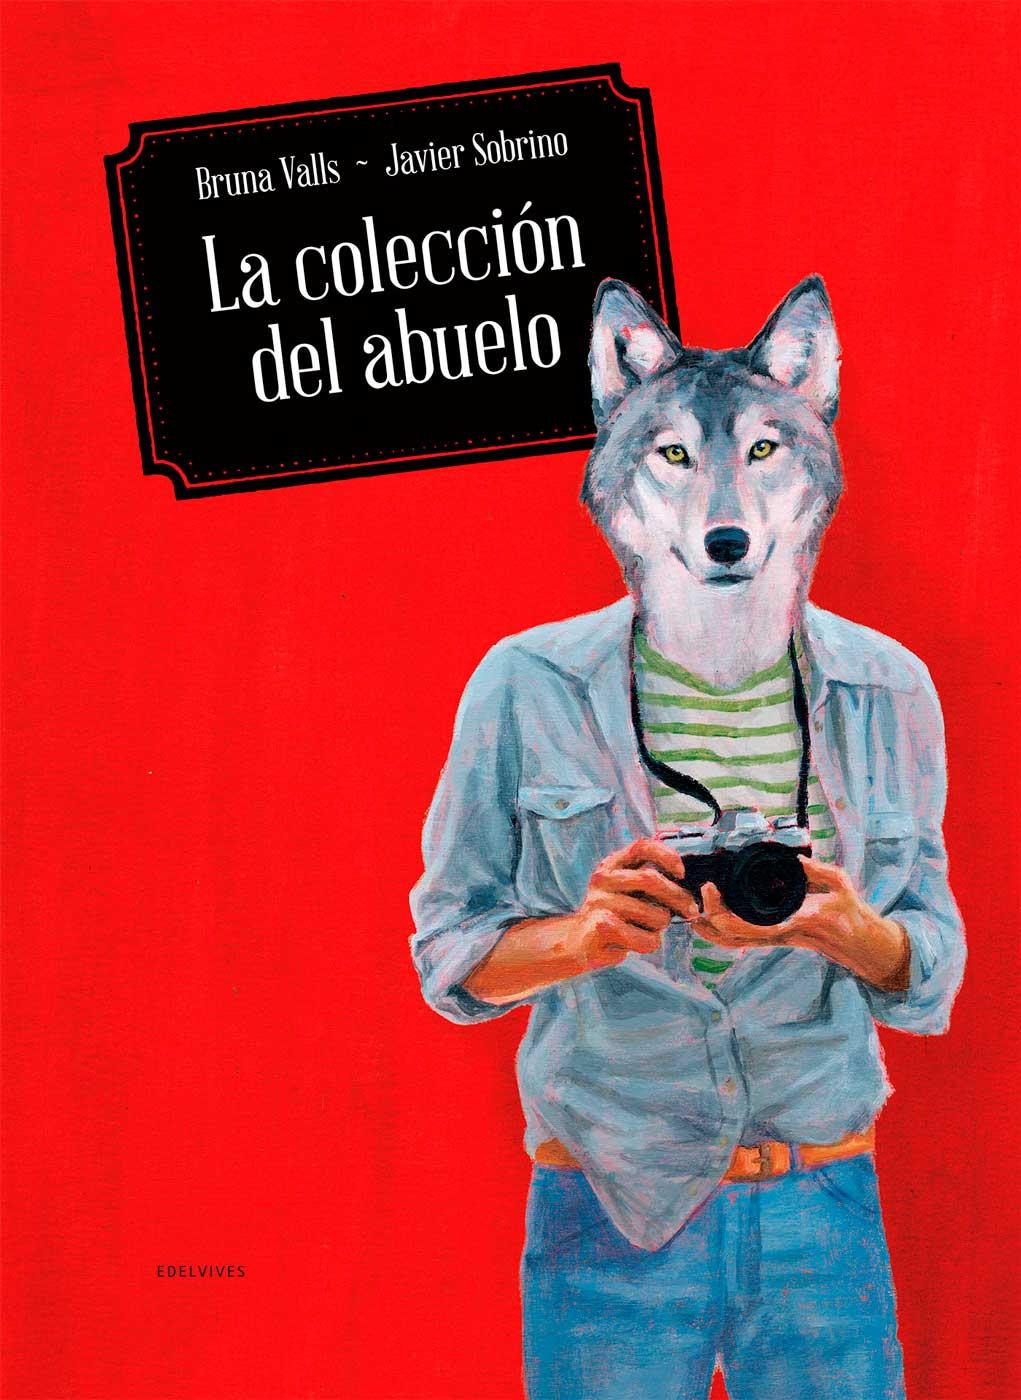 https://www.edelvives.com/es/Catalogo/p/la-coleccion-del-abuelo